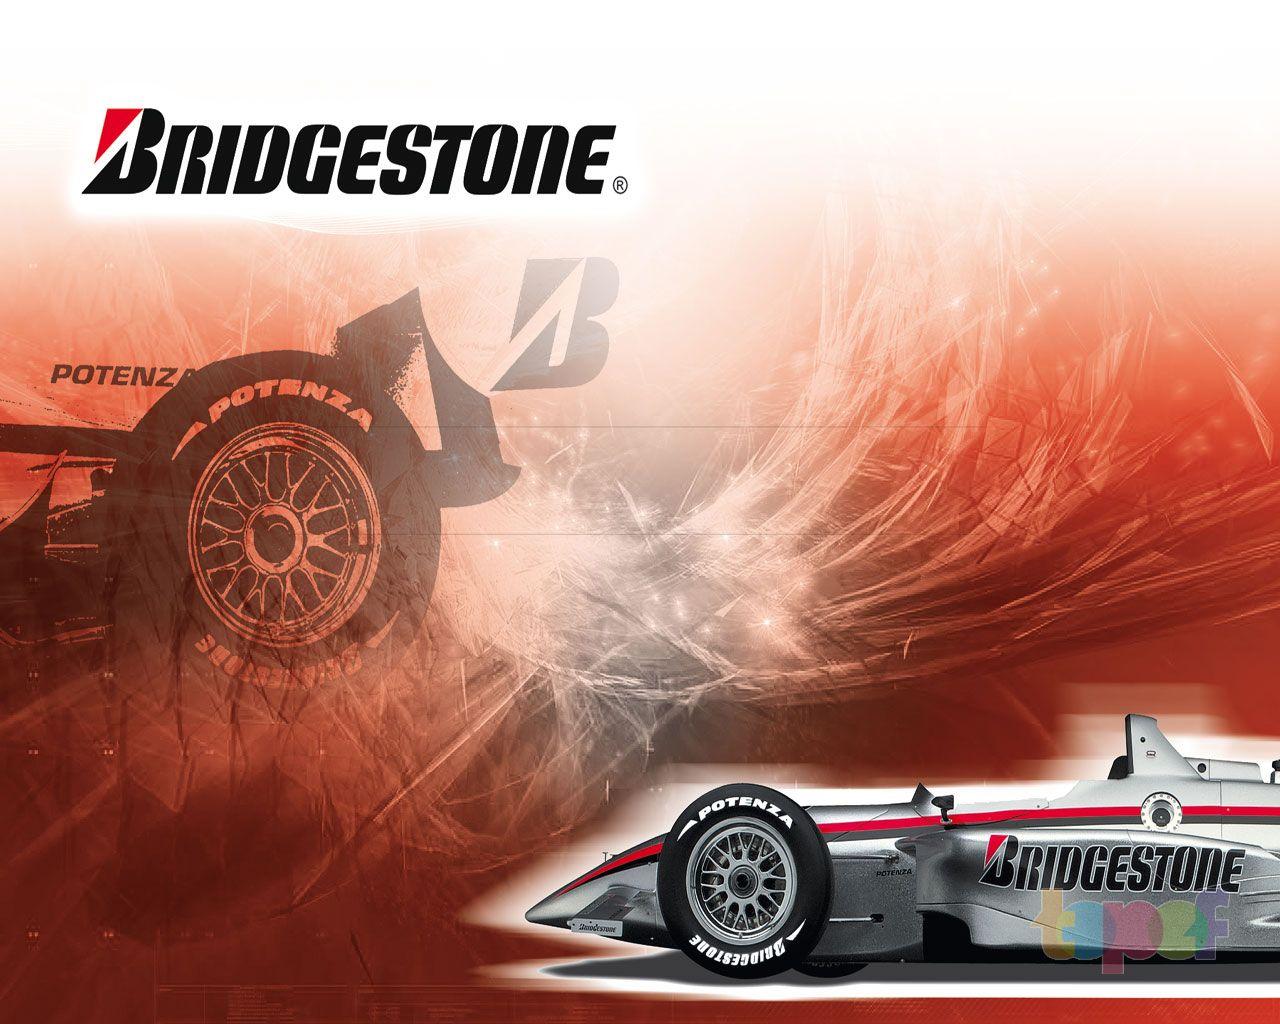 Обои от Bridgestone (Шины)